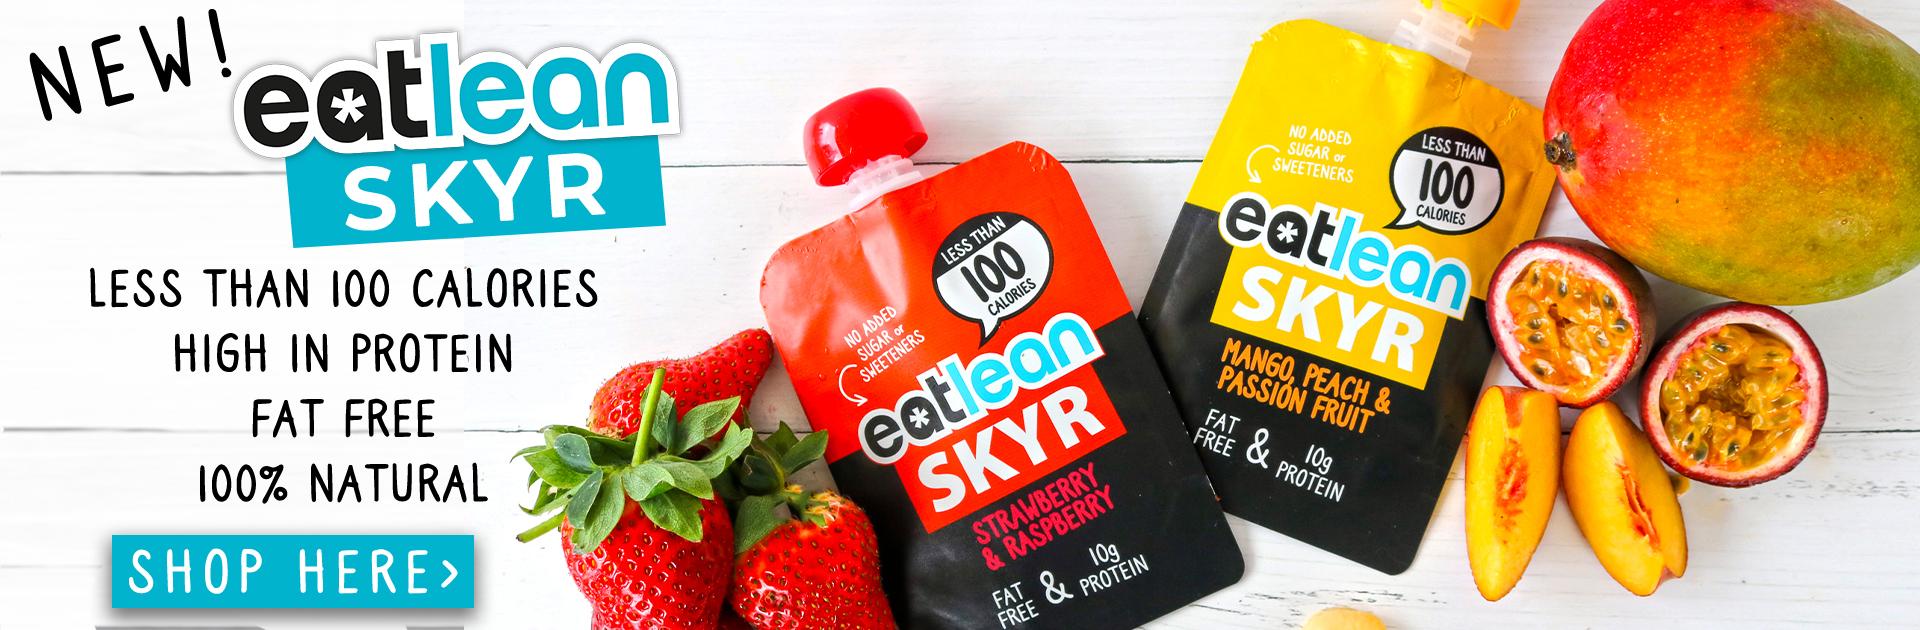 Eatlean Skyr high in protein fat free low calorie skyr